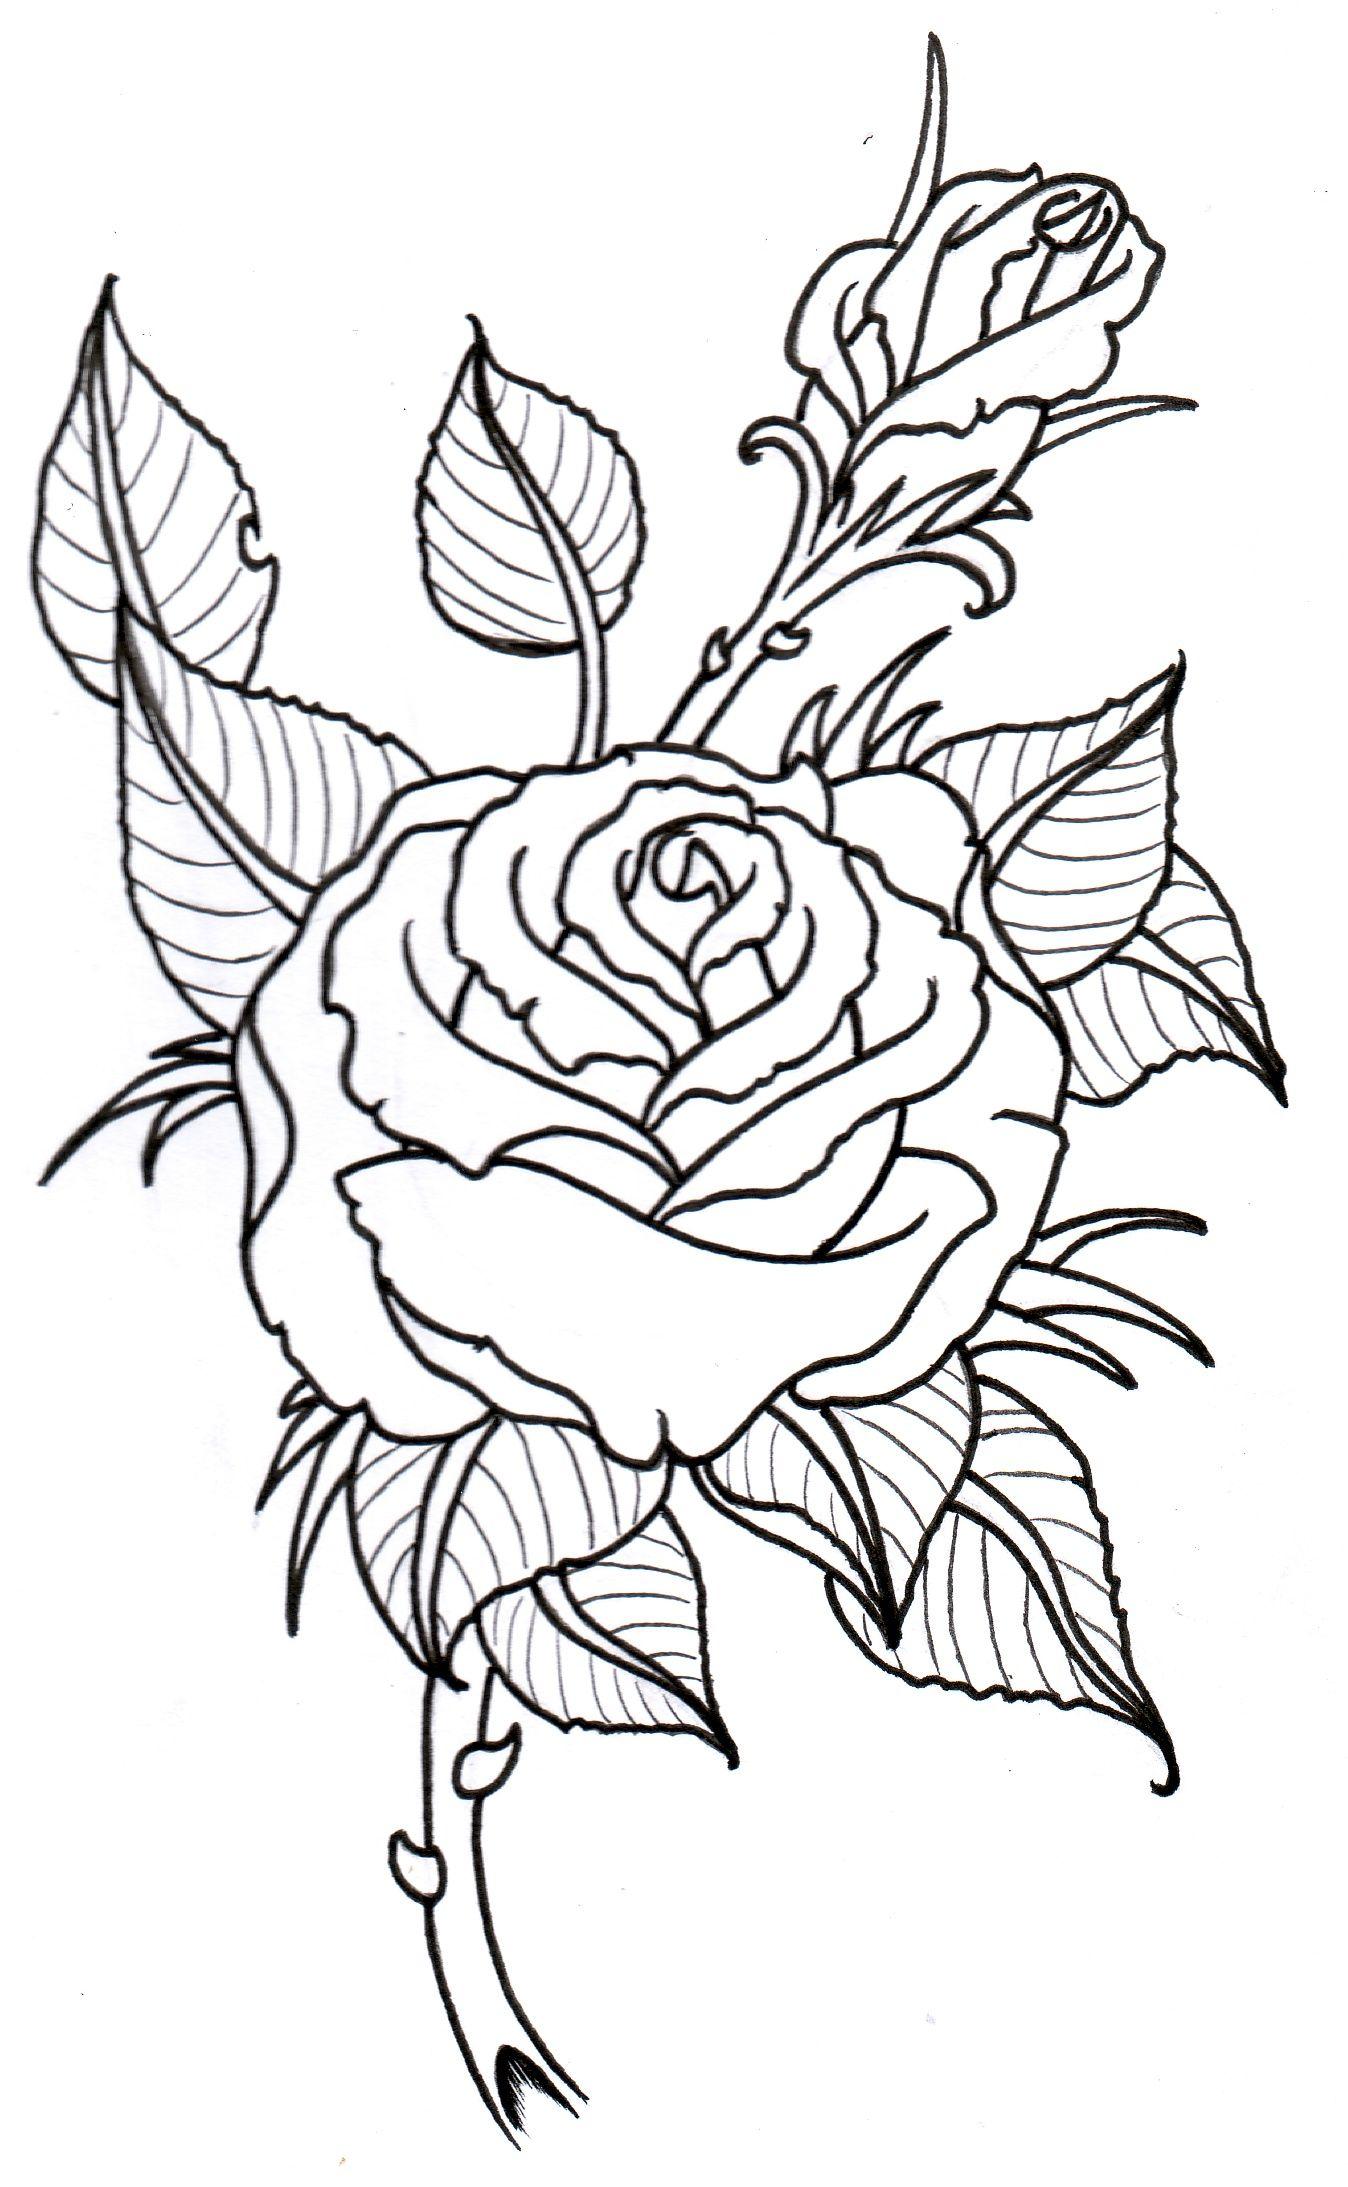 rose_outline_by_vikingtattoo.jpg (1348×2187) | Leathercraft ...